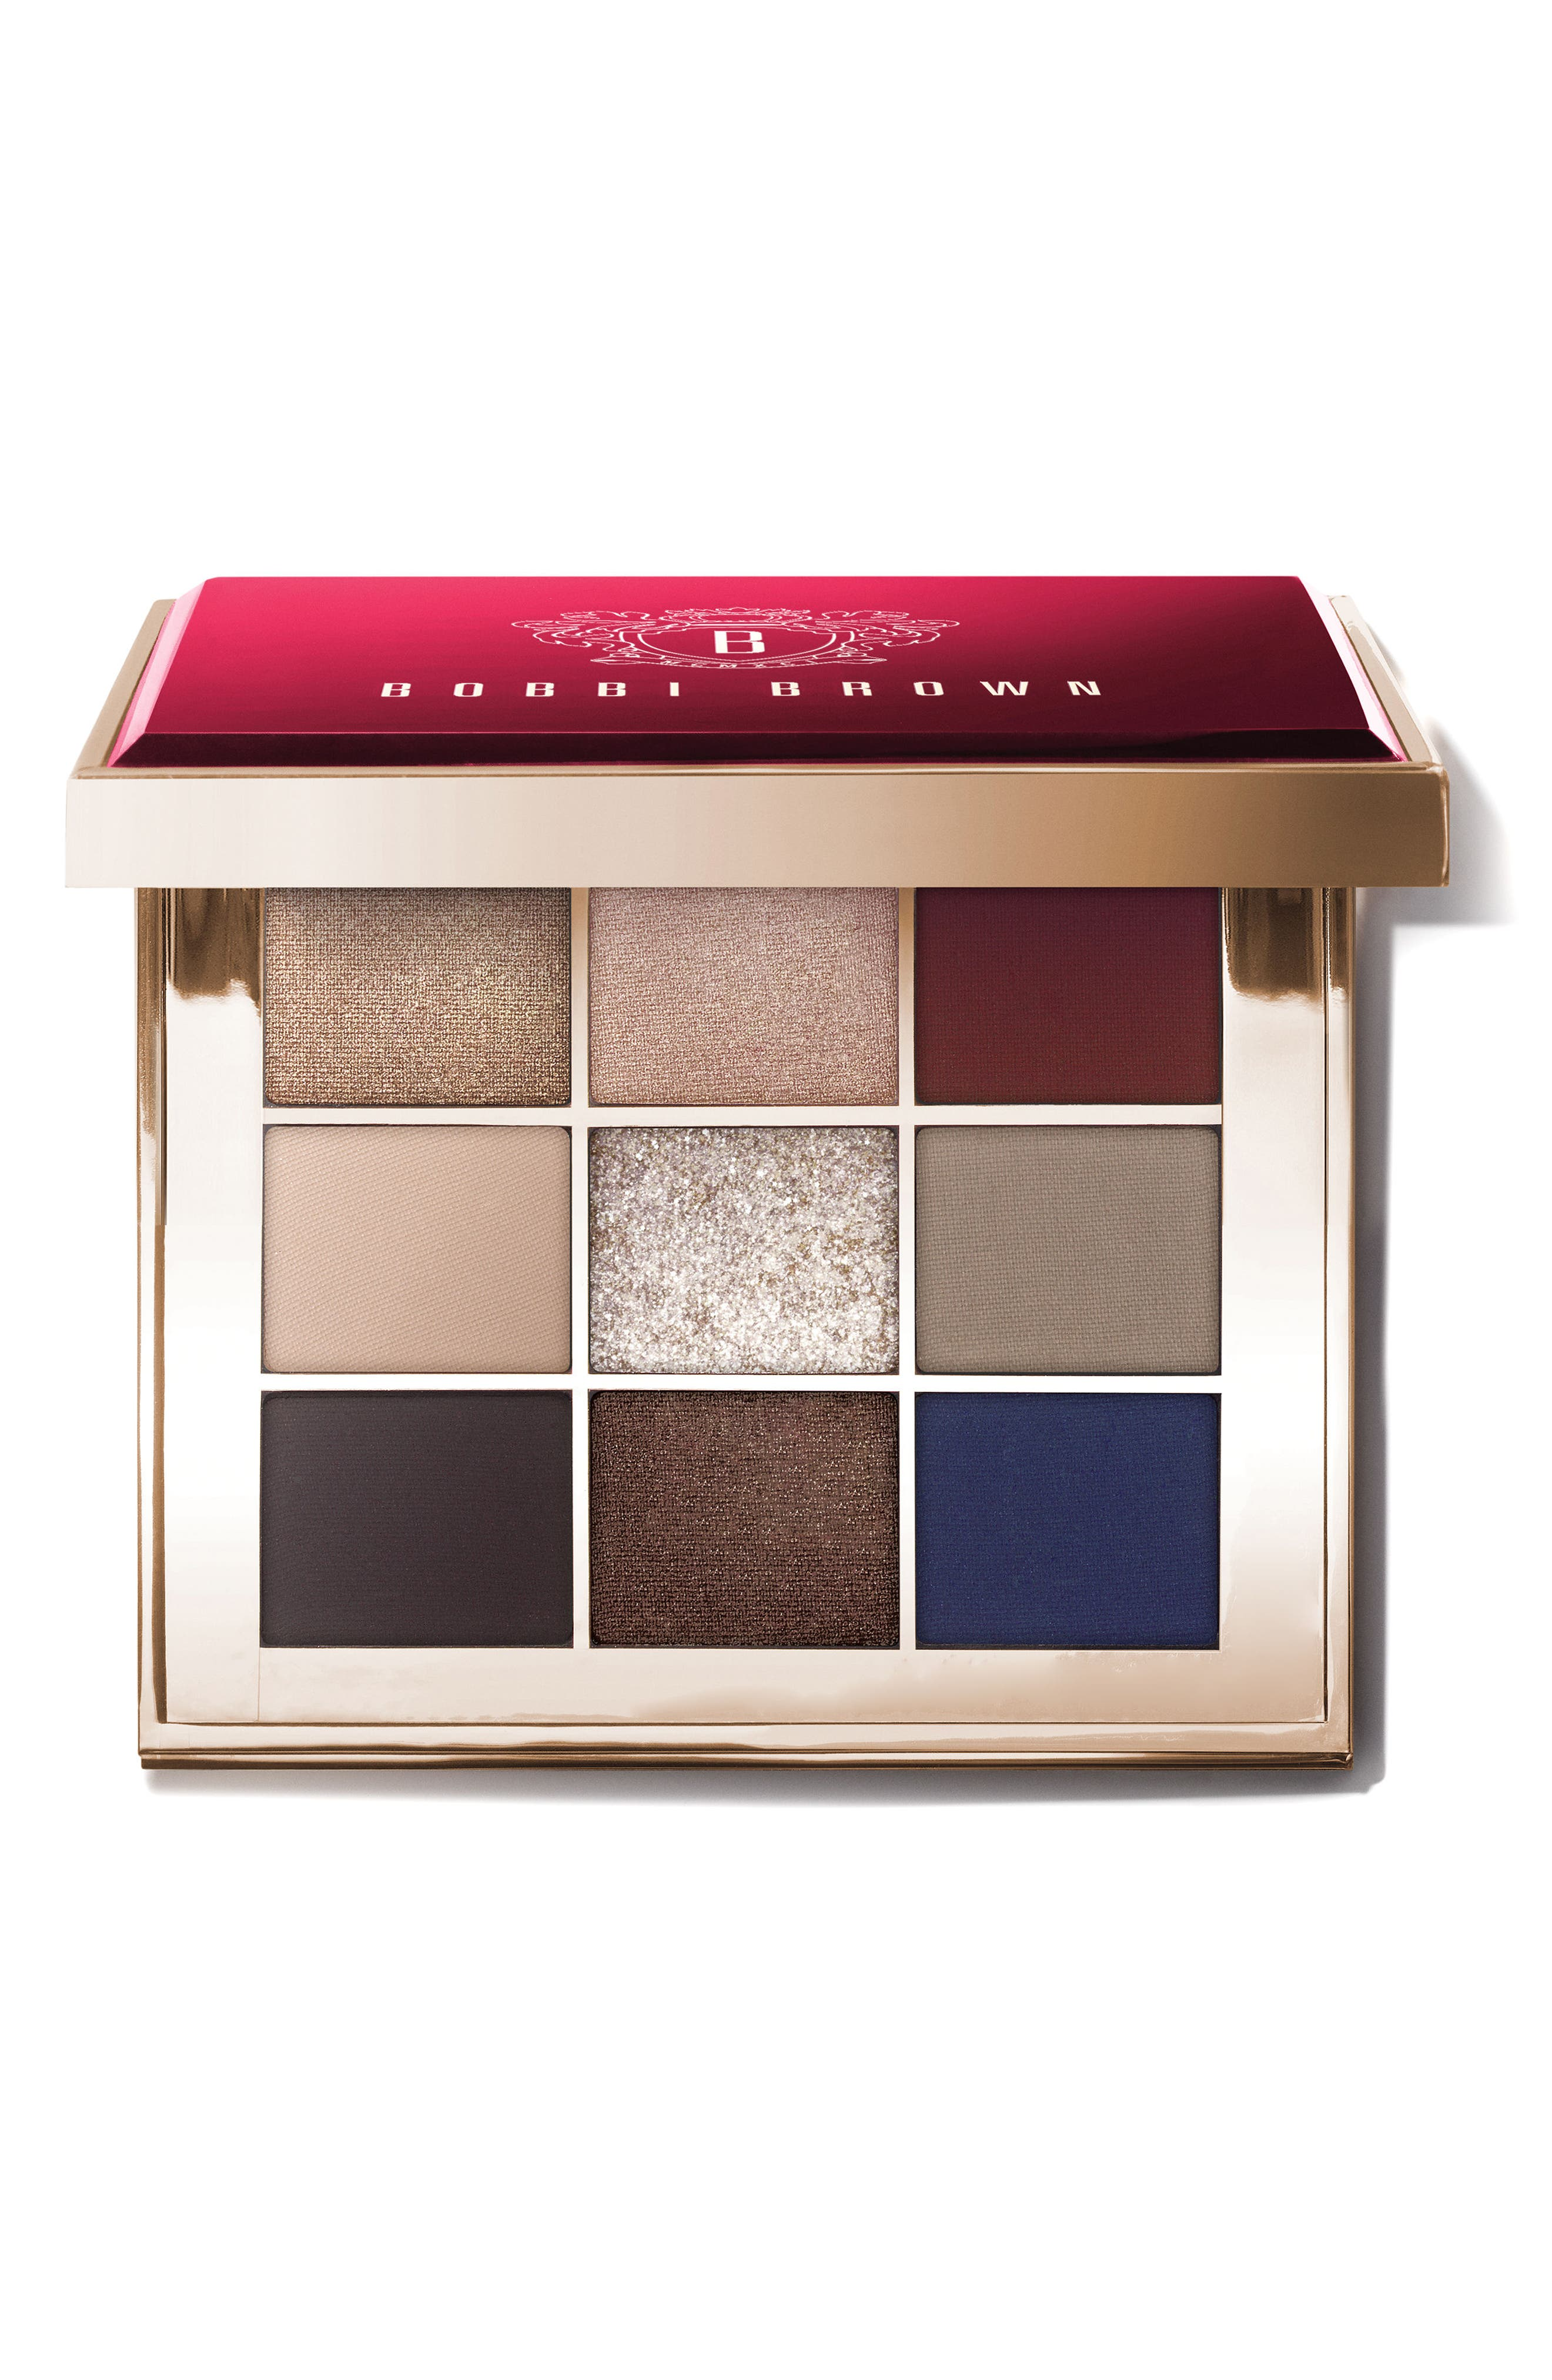 Caviar & Rubies Eyeshadow Palette,                         Main,                         color, 000